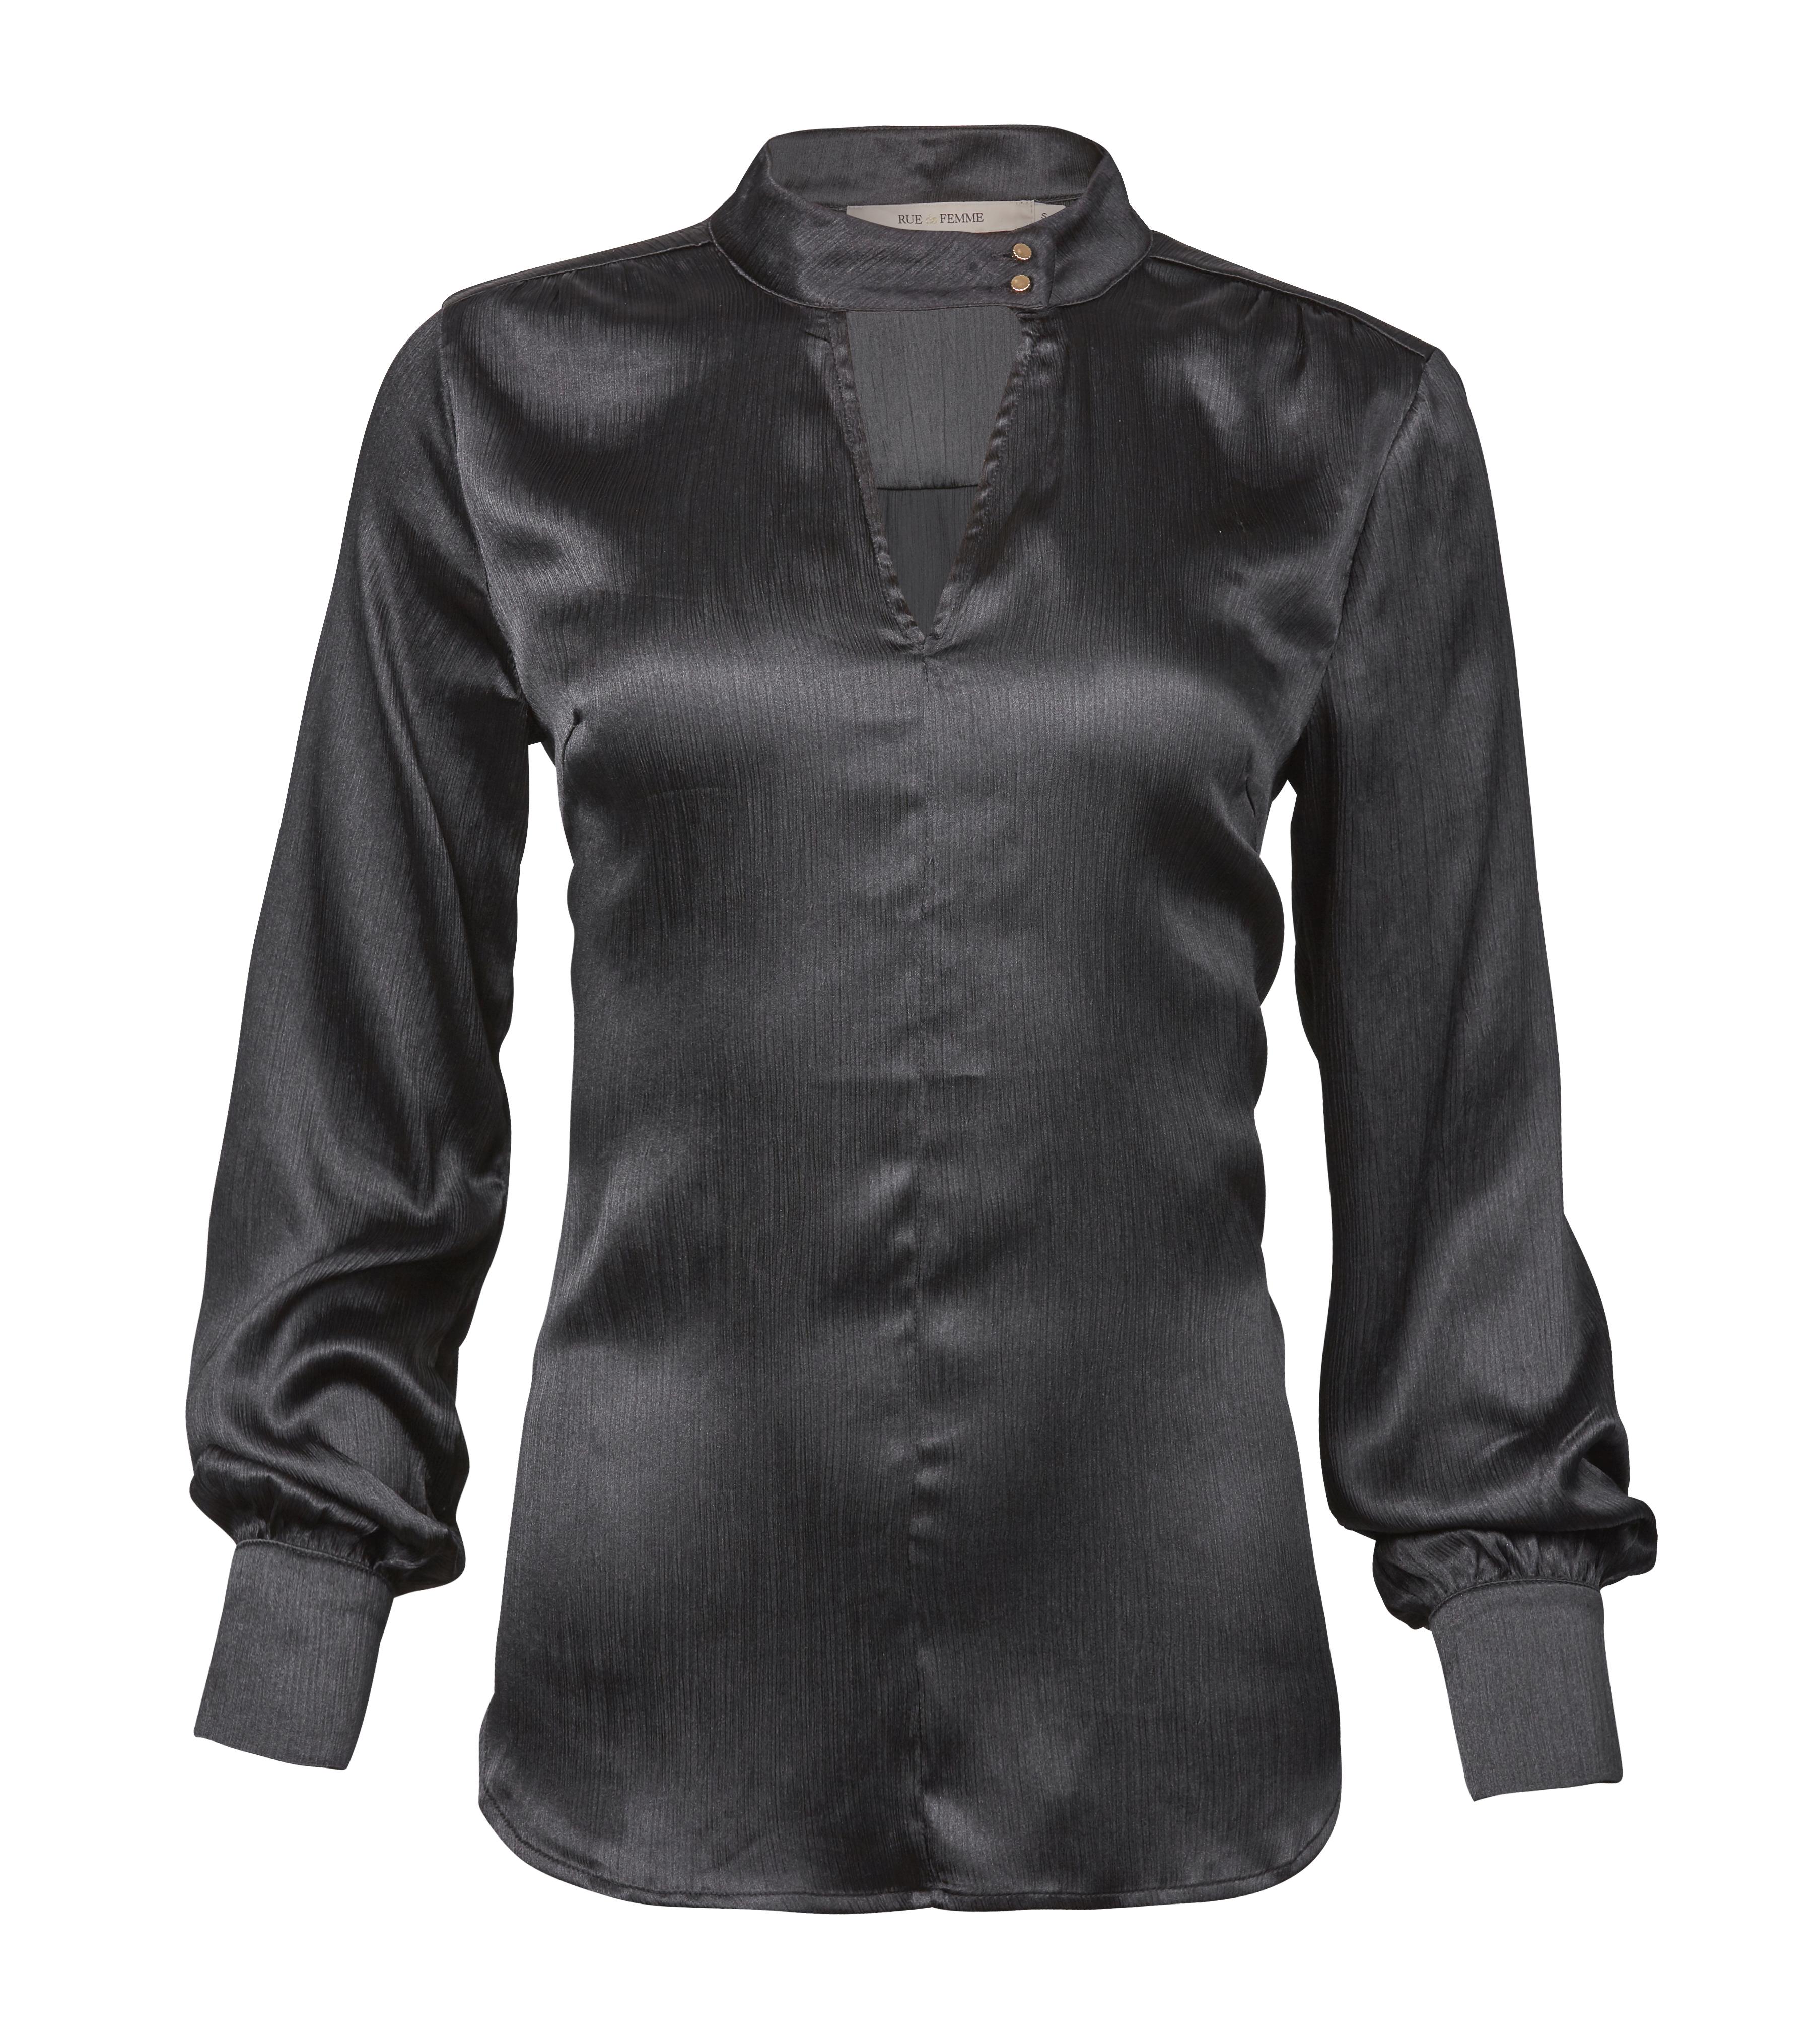 689dbb25 Sort bluser fra Rue de Femme – Rue de Femme sort bluse Jerry – Mio Trend